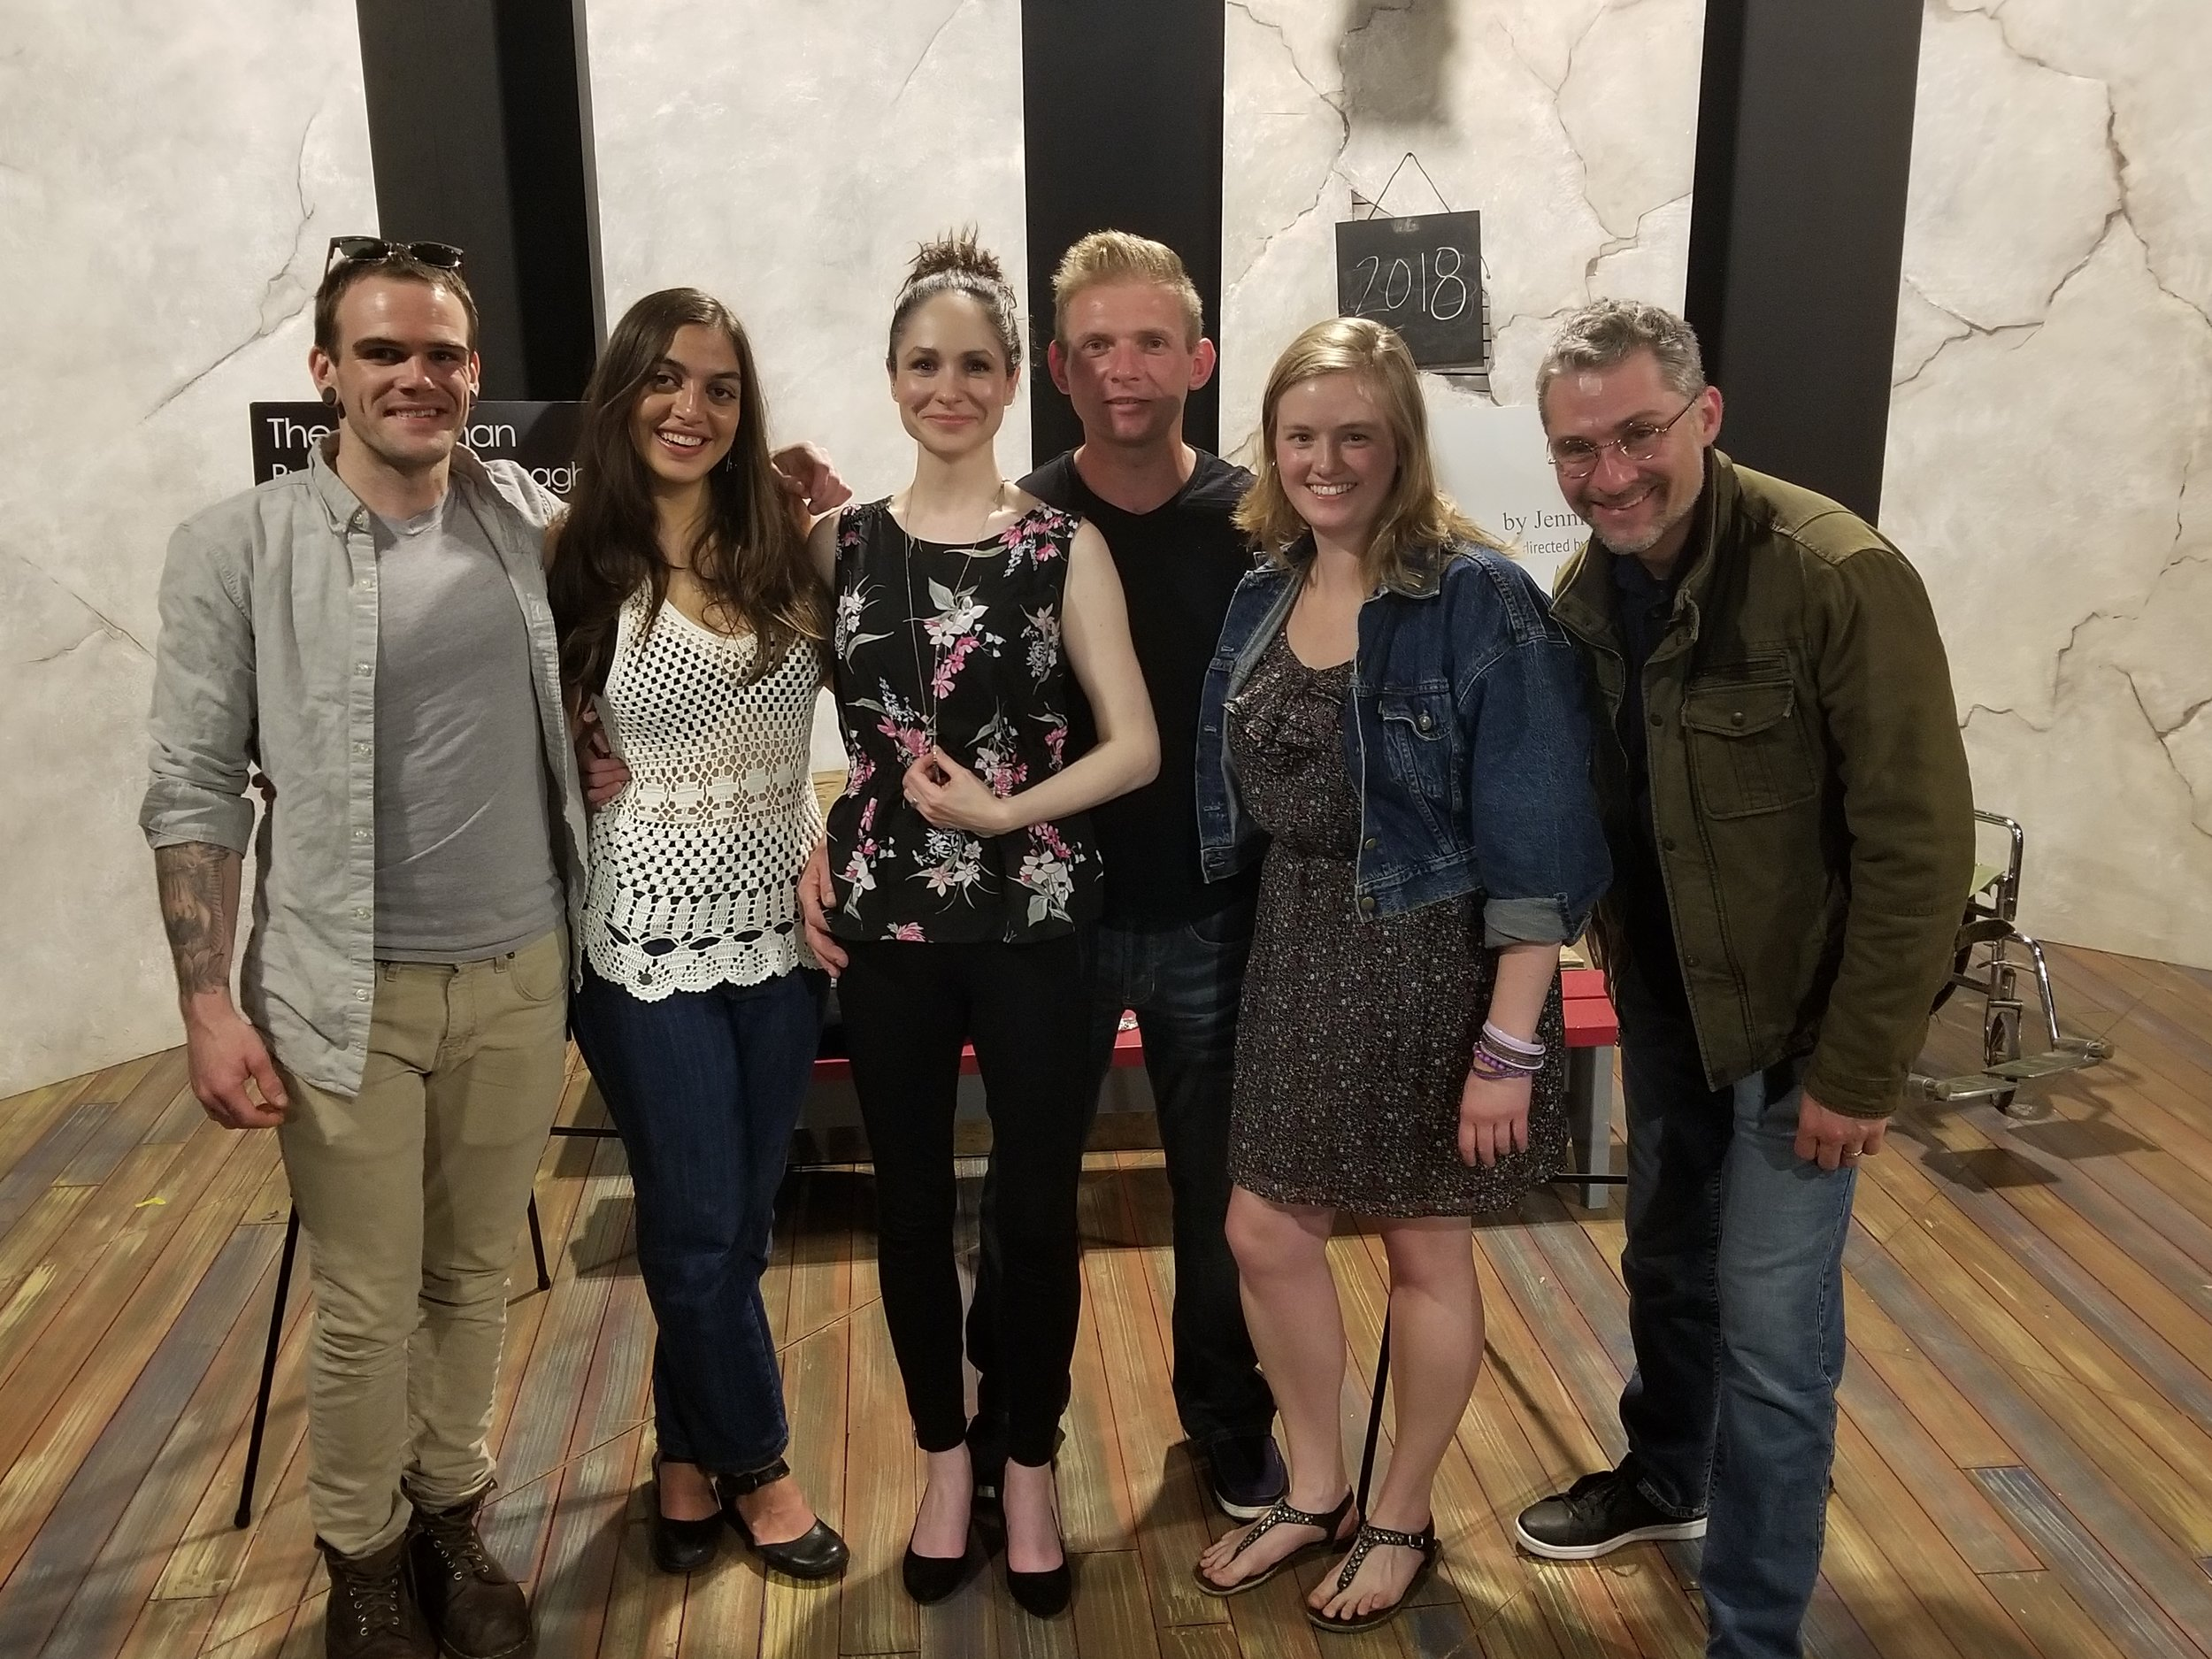 Rob Schreiner, Solana Ramírez-García, Jaimelyn Gray, Les Zarzecki, Dana Vetter, and Matthew Ivan Bennett